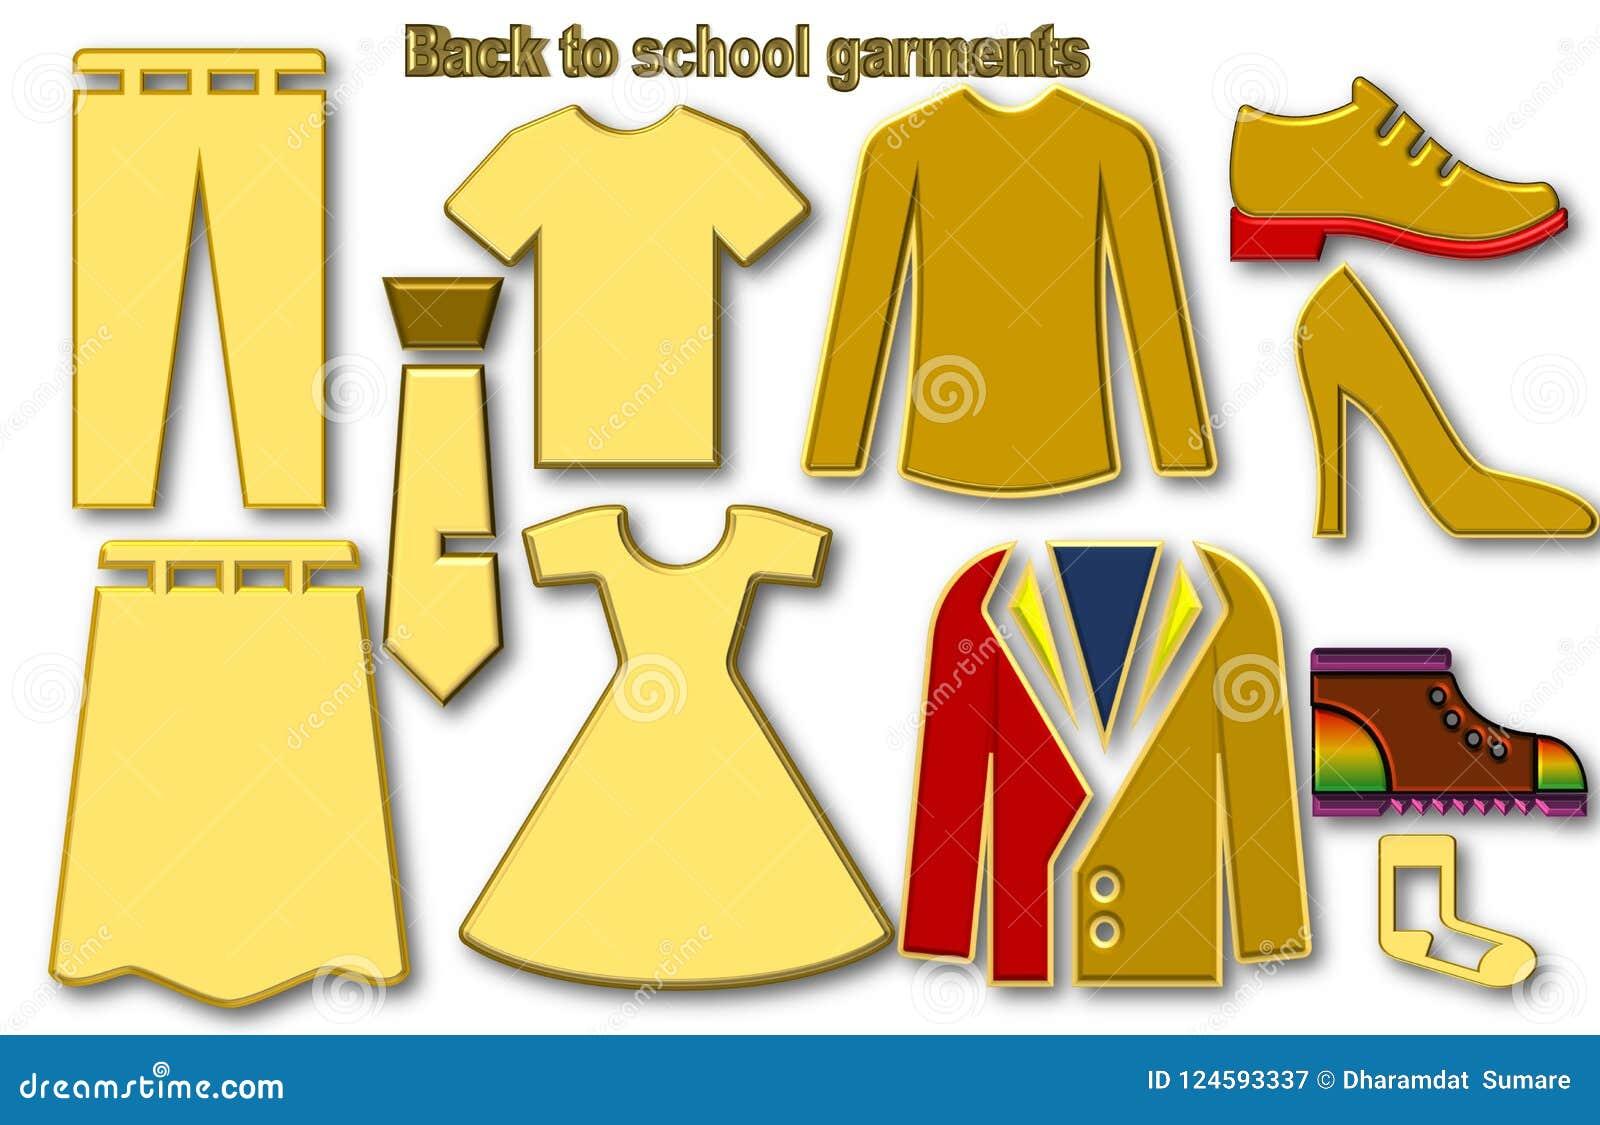 Back to school garments